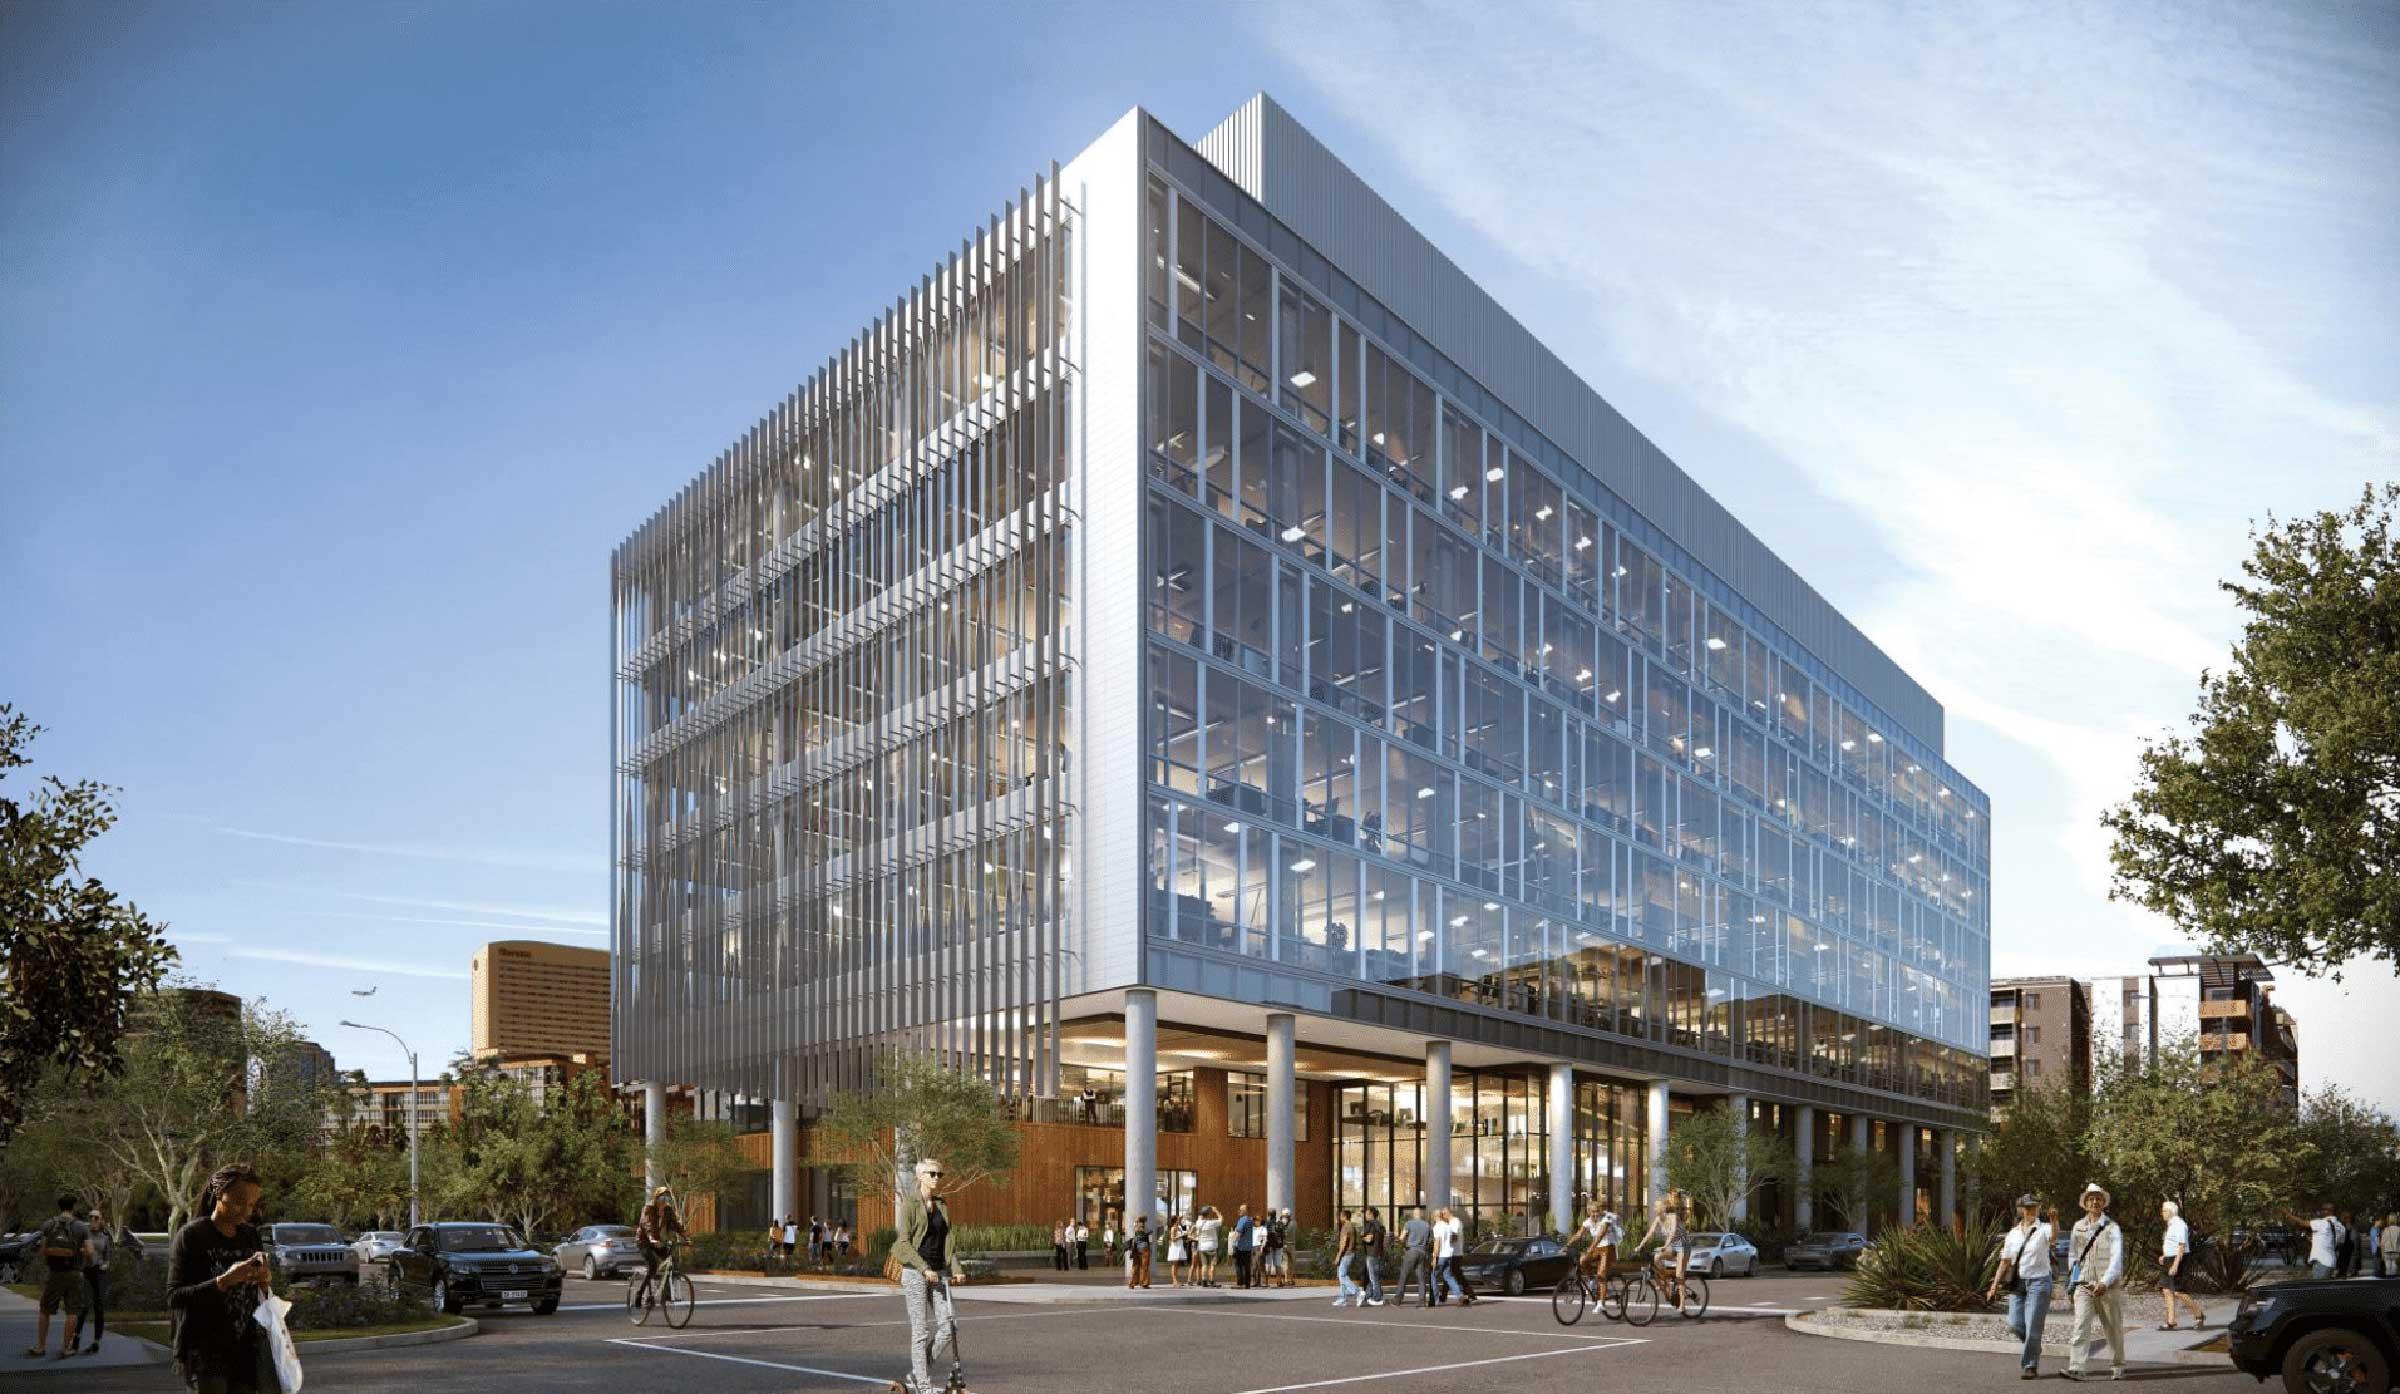 Artist rendering of Wexford Building in downtown Phoenix